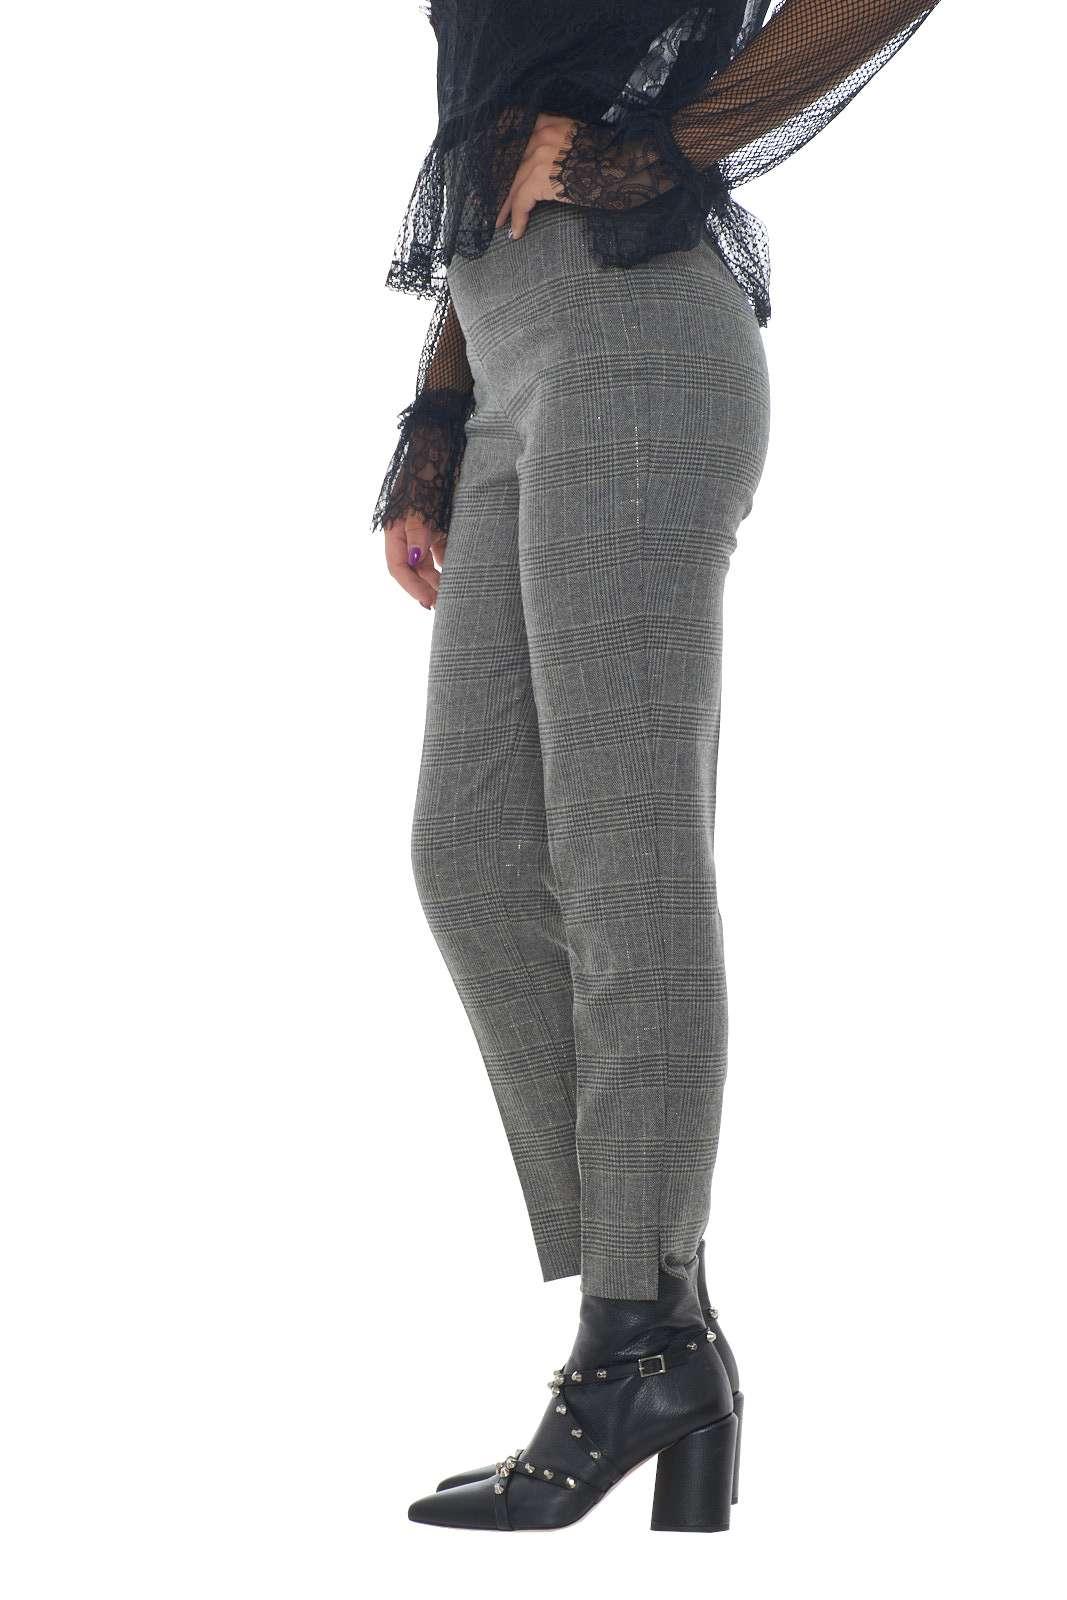 https://www.parmax.com/media/catalog/product/a/i/AI-outlet_parmax-pantaloni-donna-Twin-Set-192TT2440-B.jpg